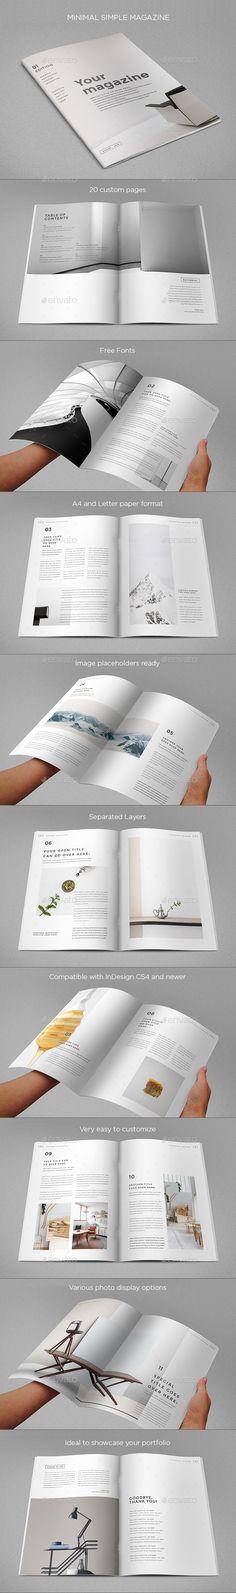 Simple Minimal Magazine Template InDesign INDD. Download here: https://graphicriver.net/item/simple-minimal-magazine/17544226?ref=ksioks